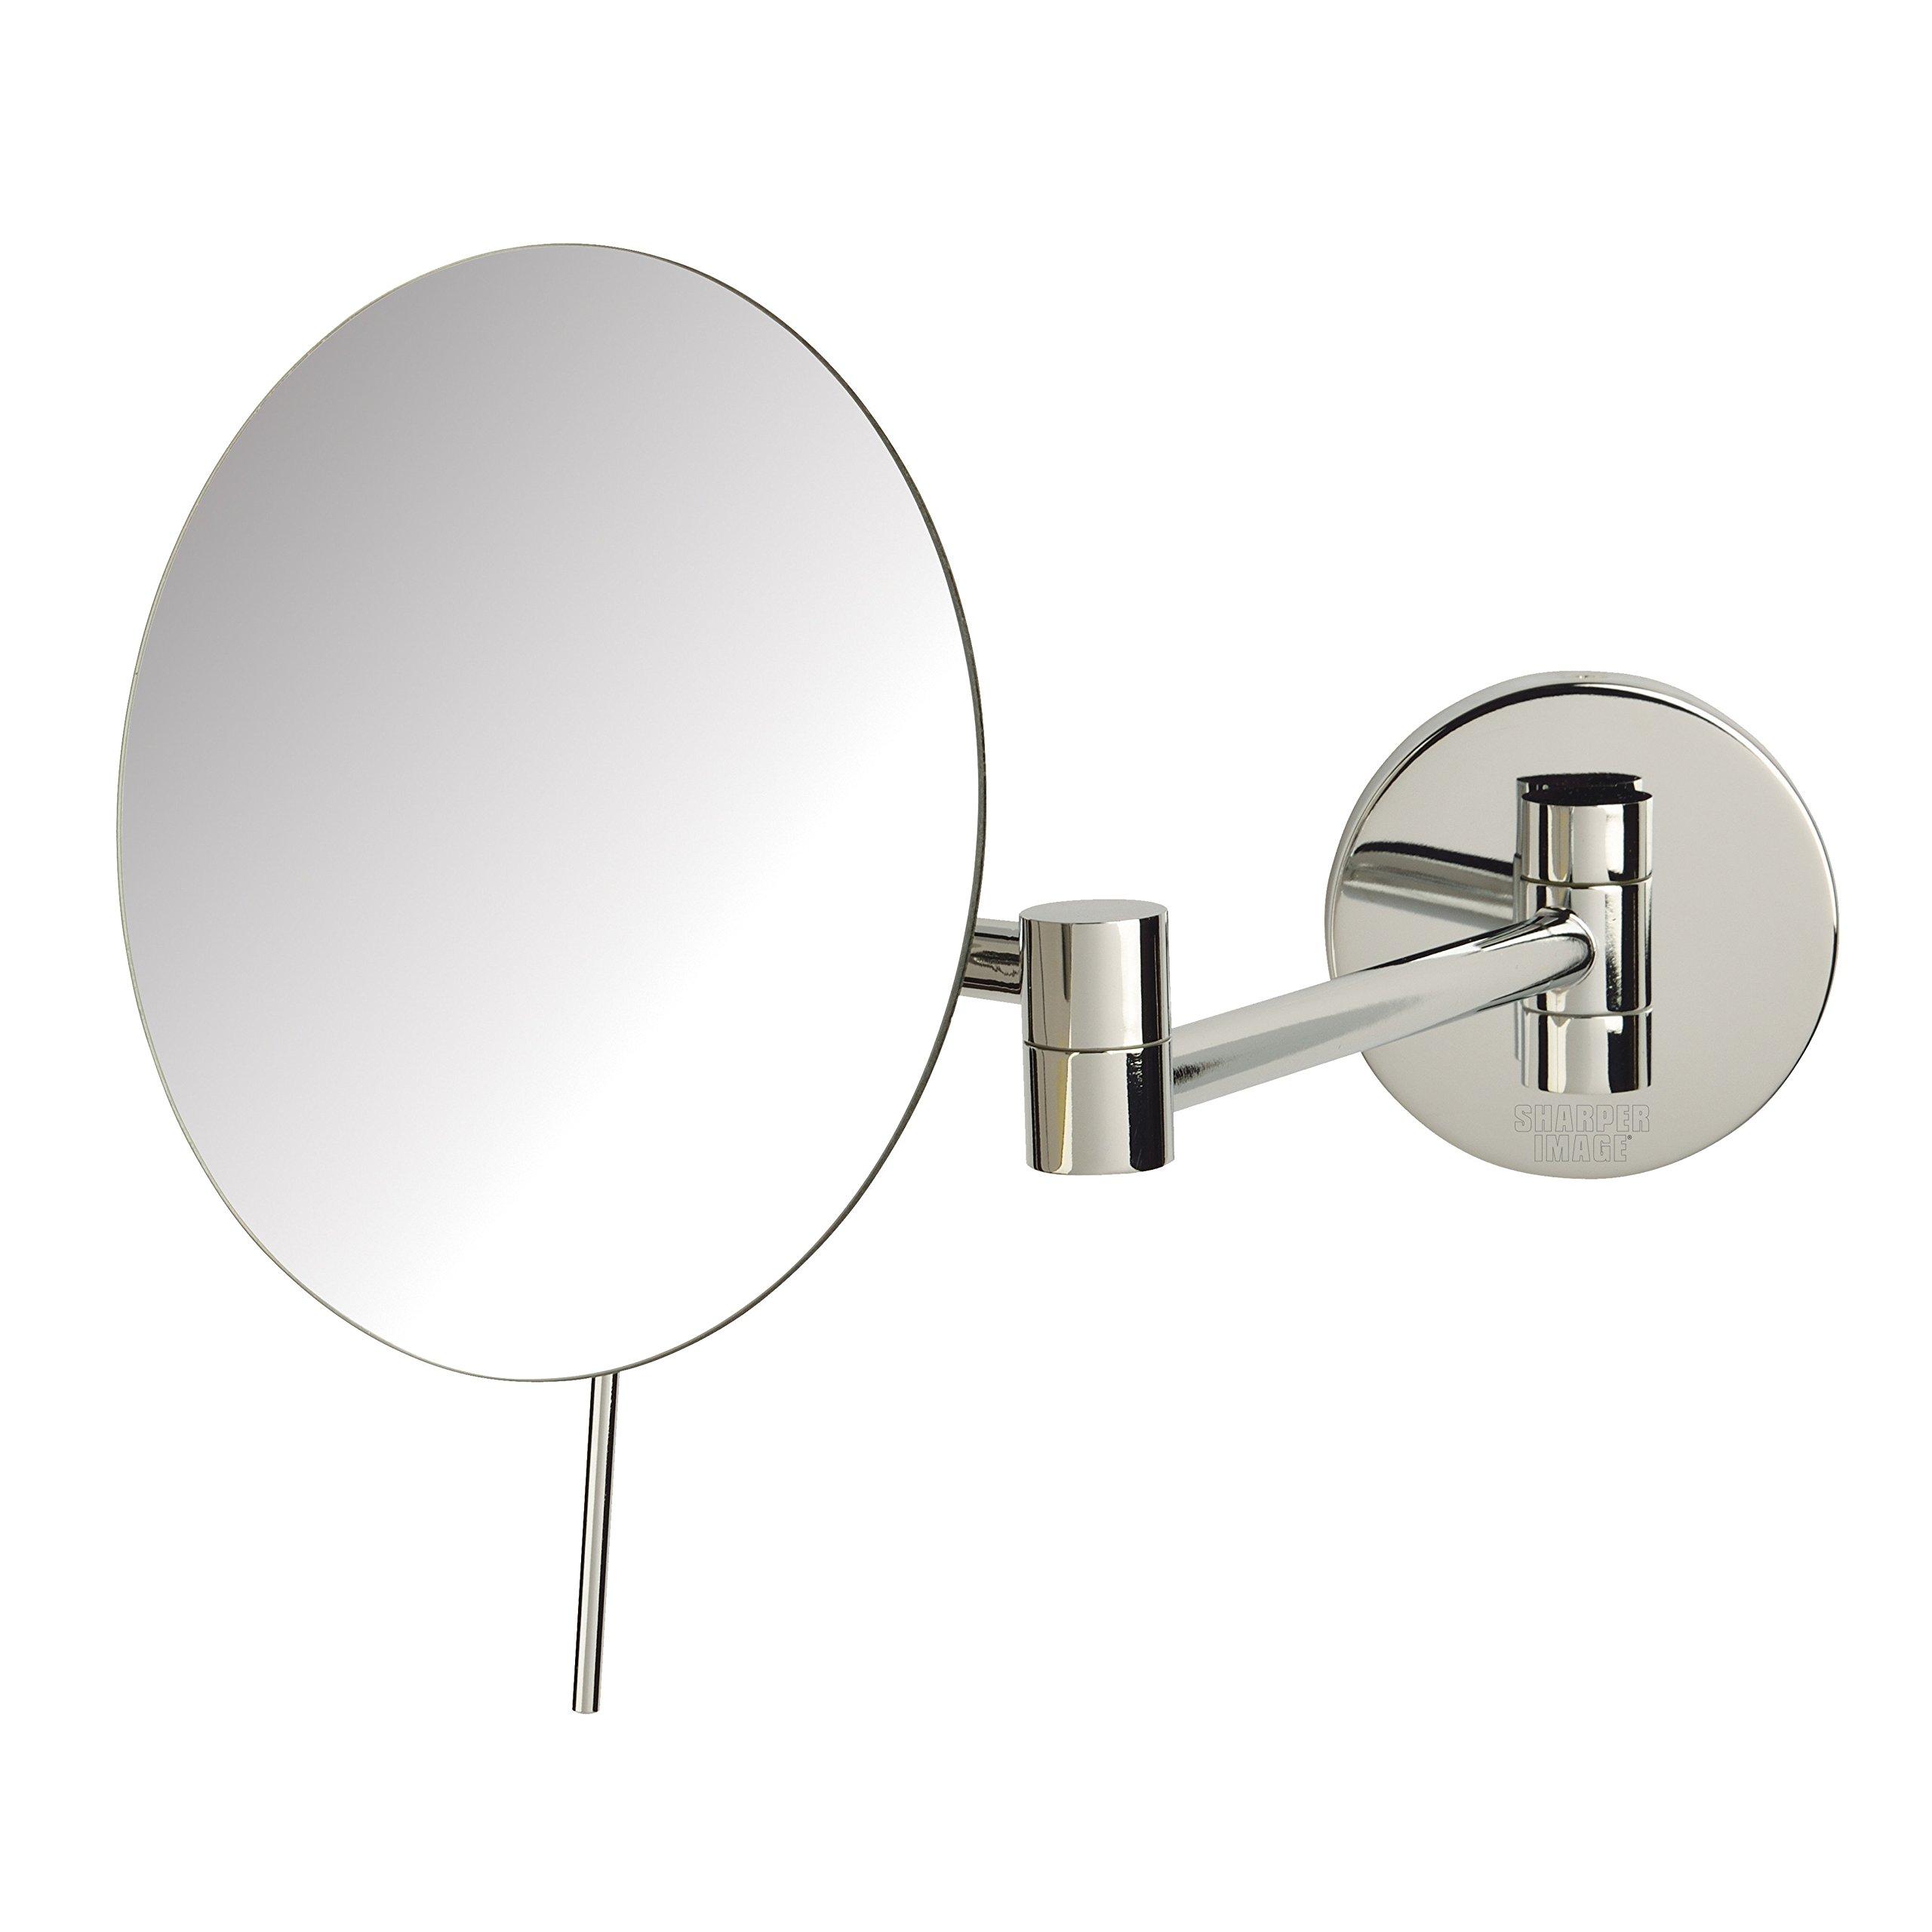 Sharper Image JRT685C 7.75-inch Slimline Wall Mount 5x Magnification Mirror, Chrome